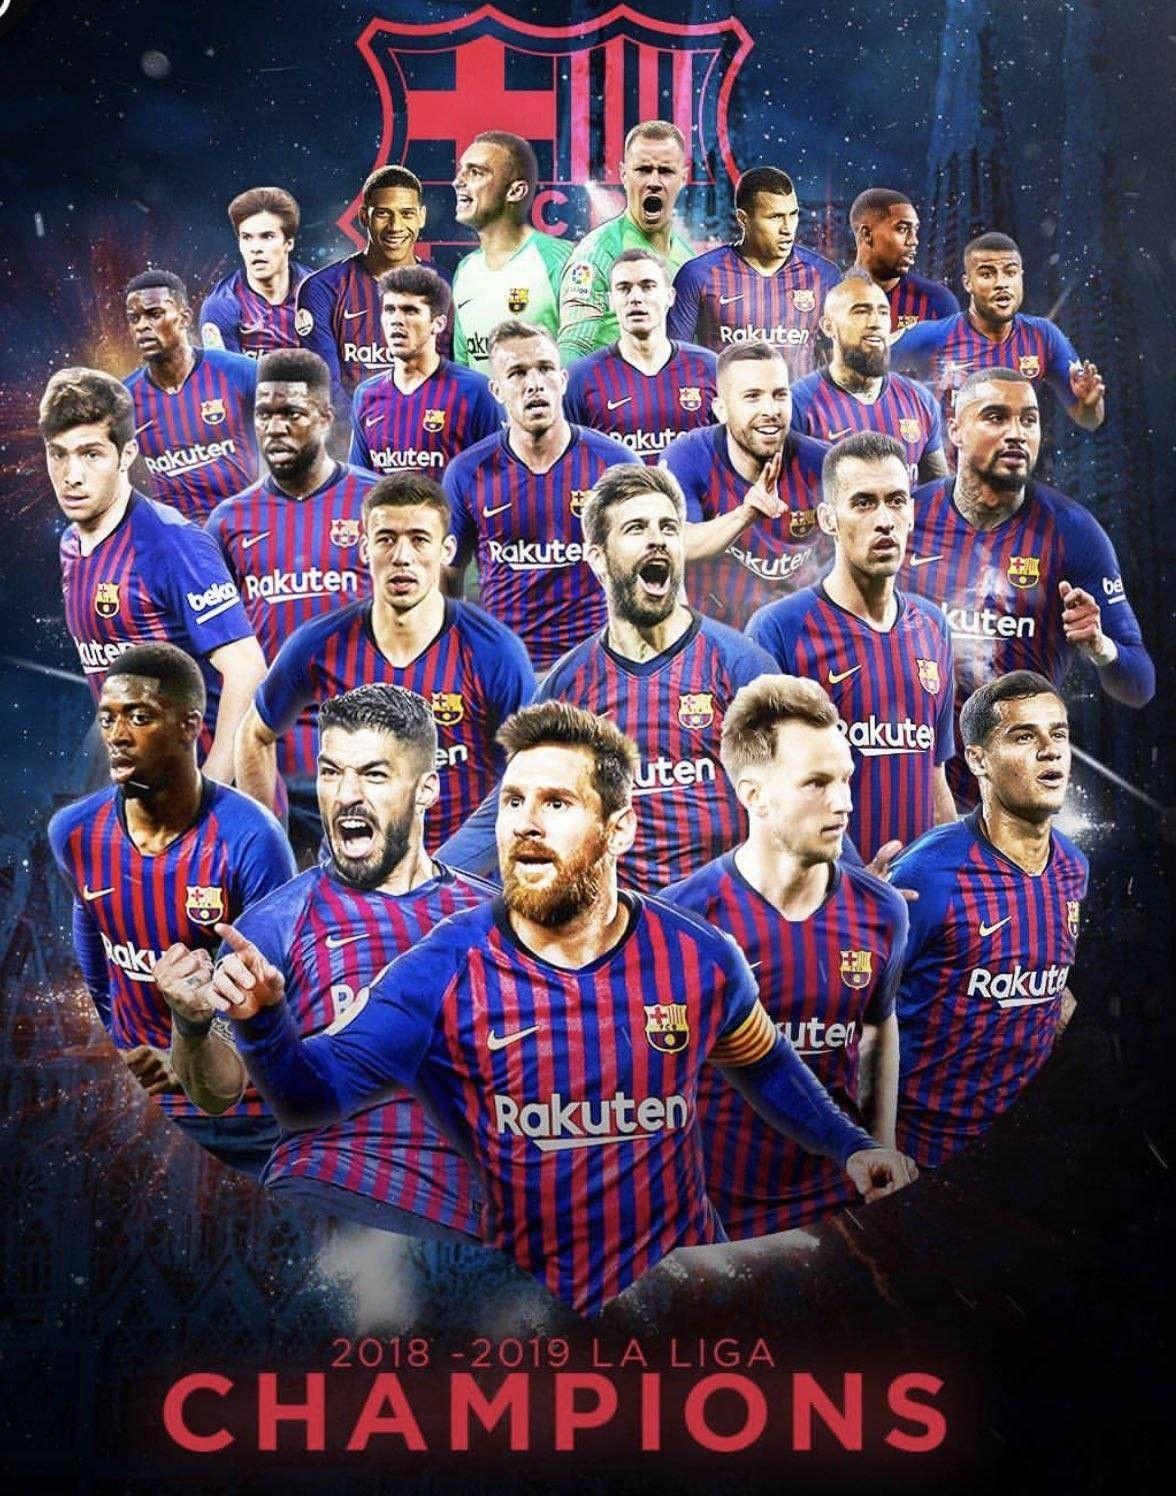 Barcelona Blaugrana おしゃれまとめの人気アイデア